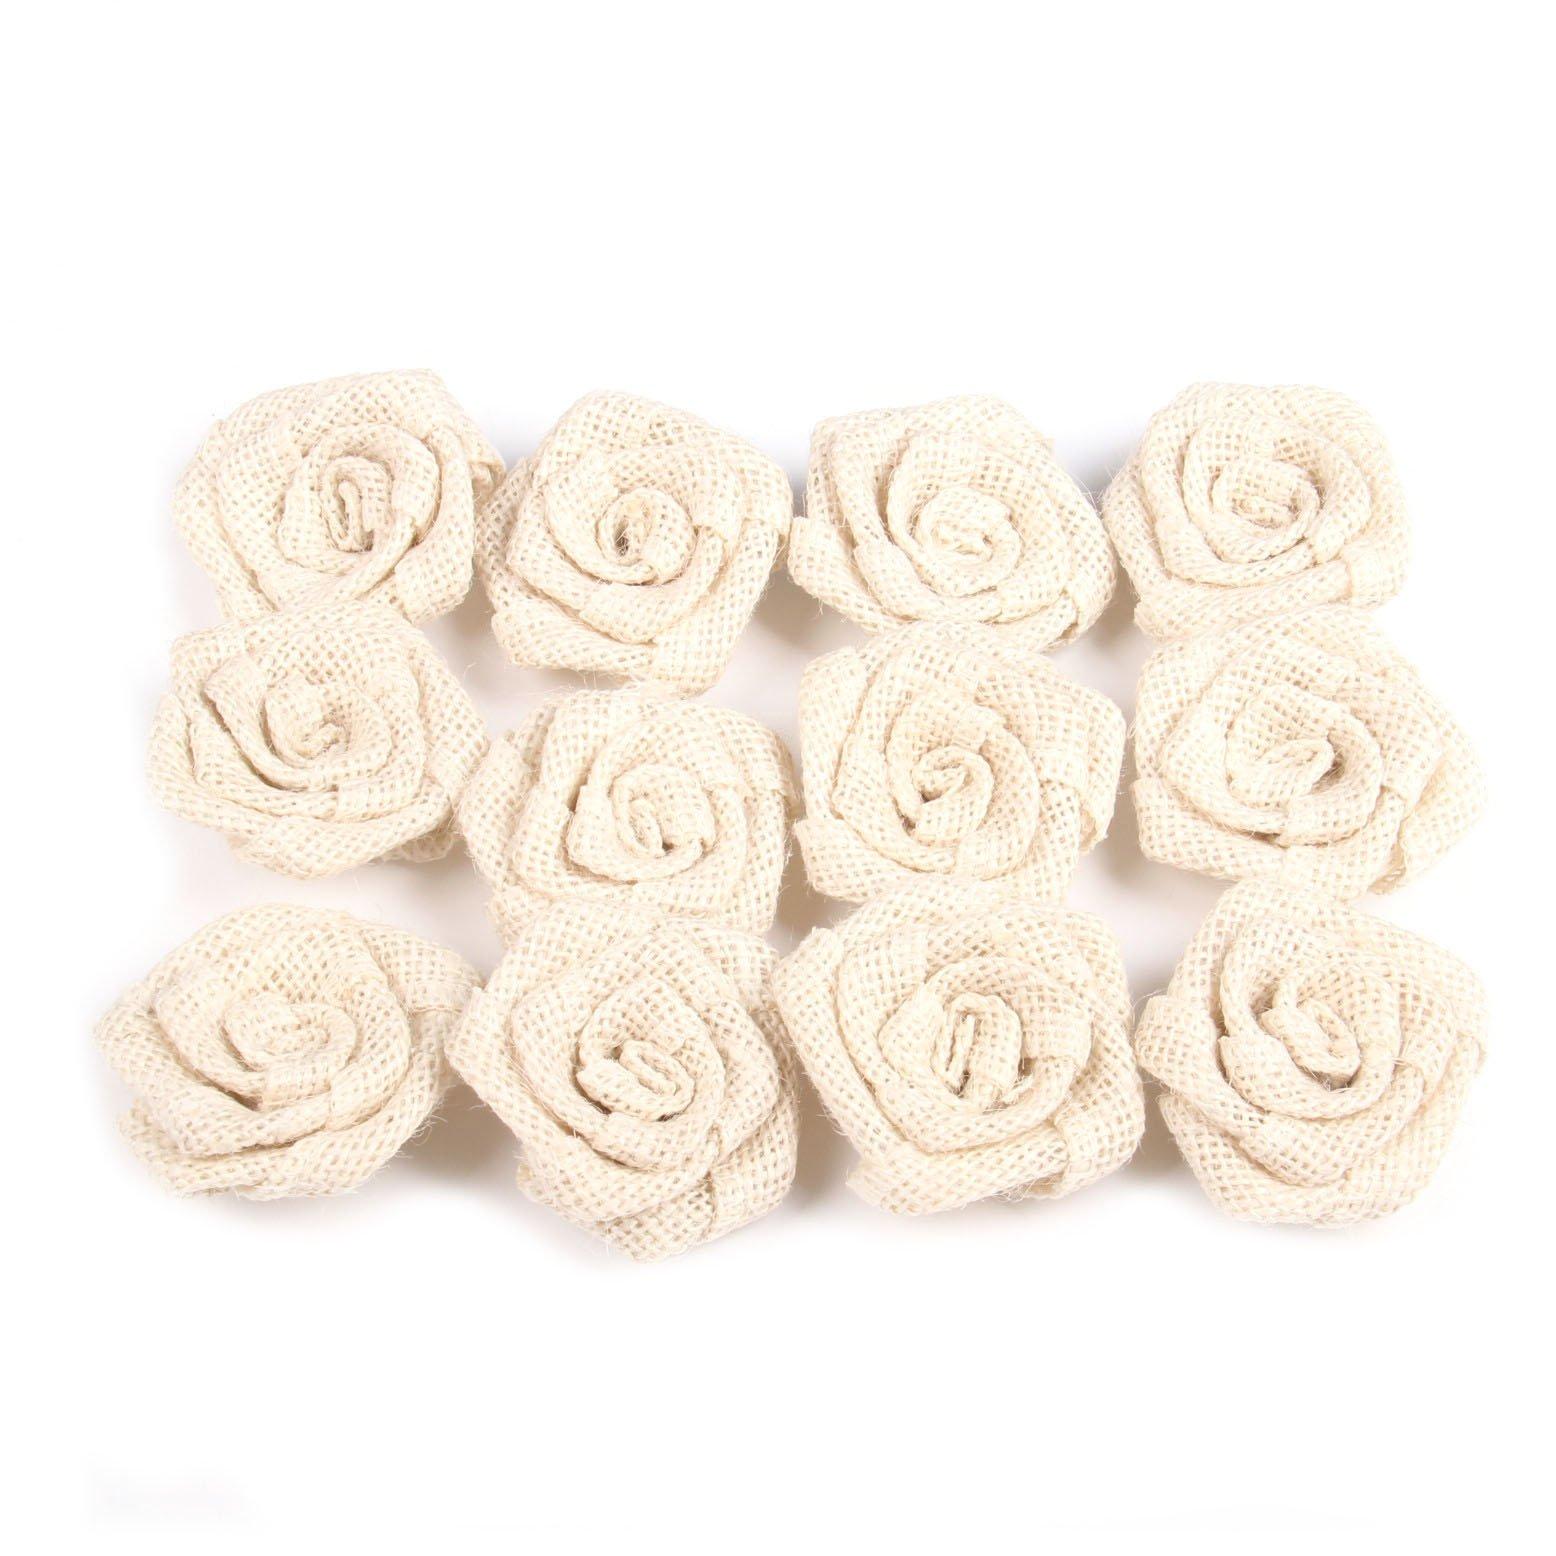 Junxia Bud Silk Linen Little Rose for Children Holiday Party Decoration Christmas Wedding Decoration 12pcs (ivory)